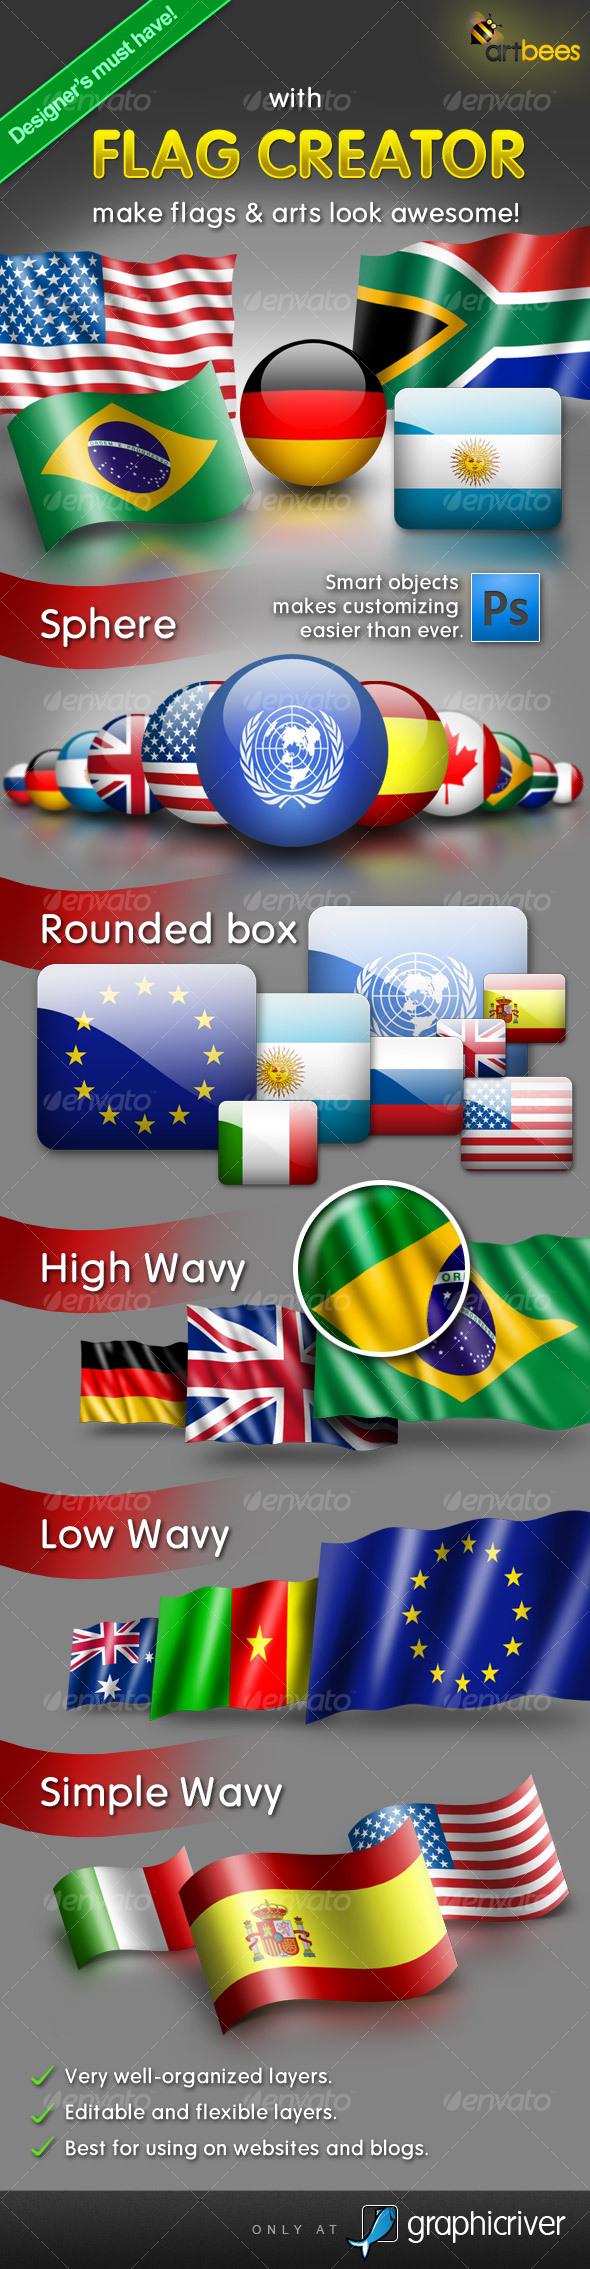 GraphicRiver Flag Creator 108604